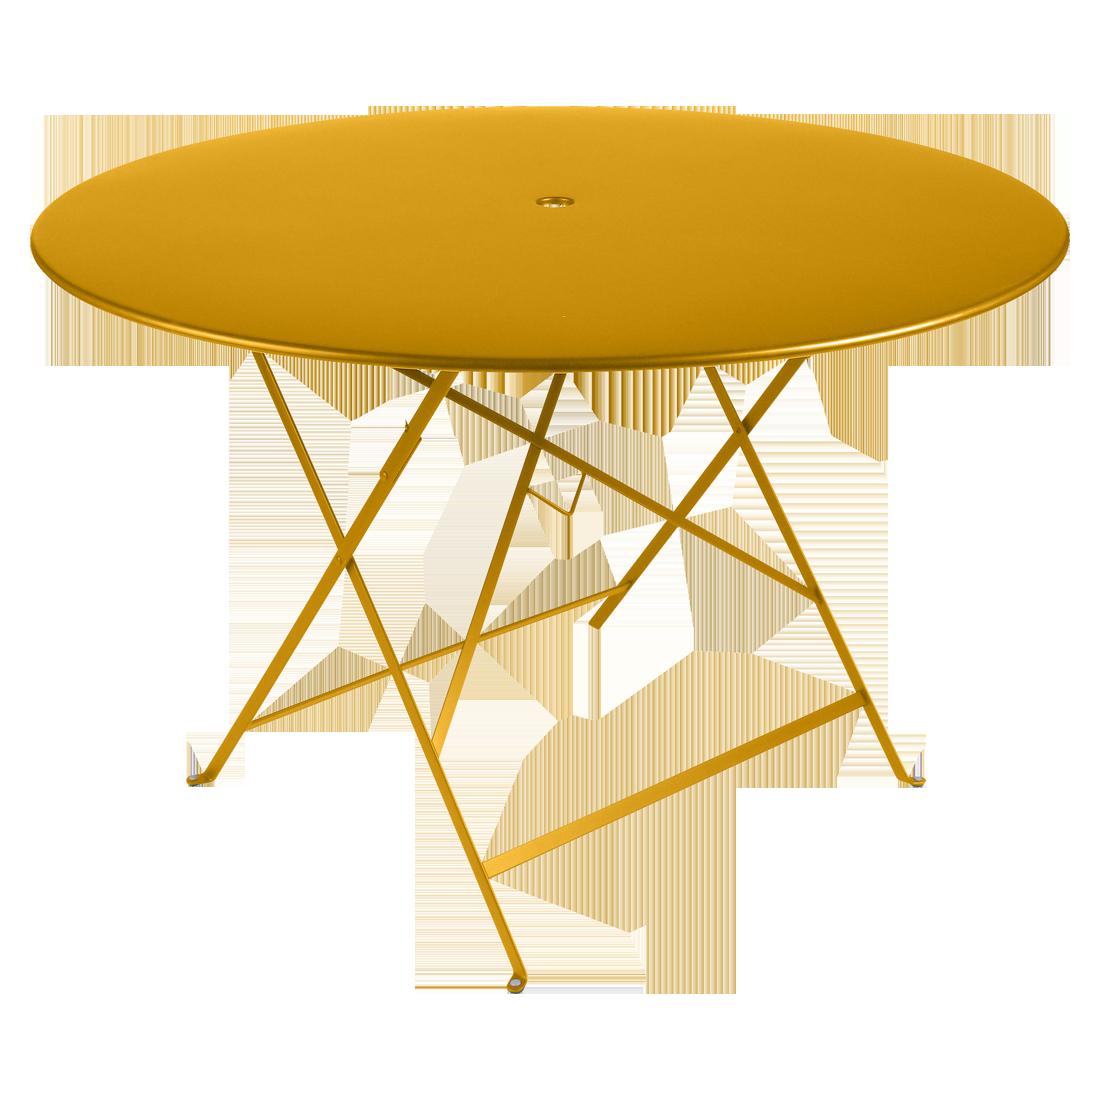 Marvelous Ø 117 Cm Table. Bistro